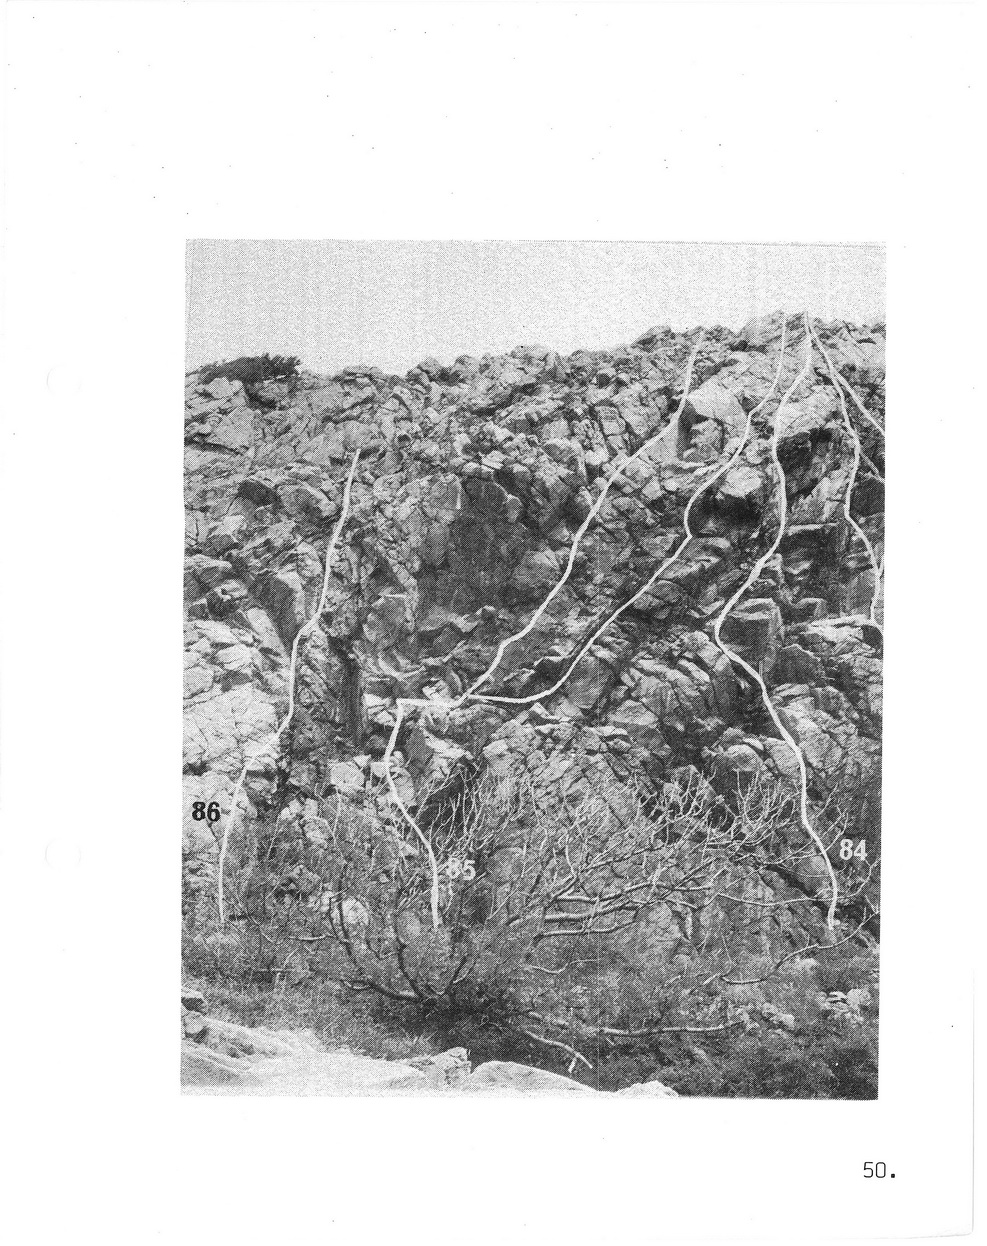 Kullen guide 1972 050.jpg